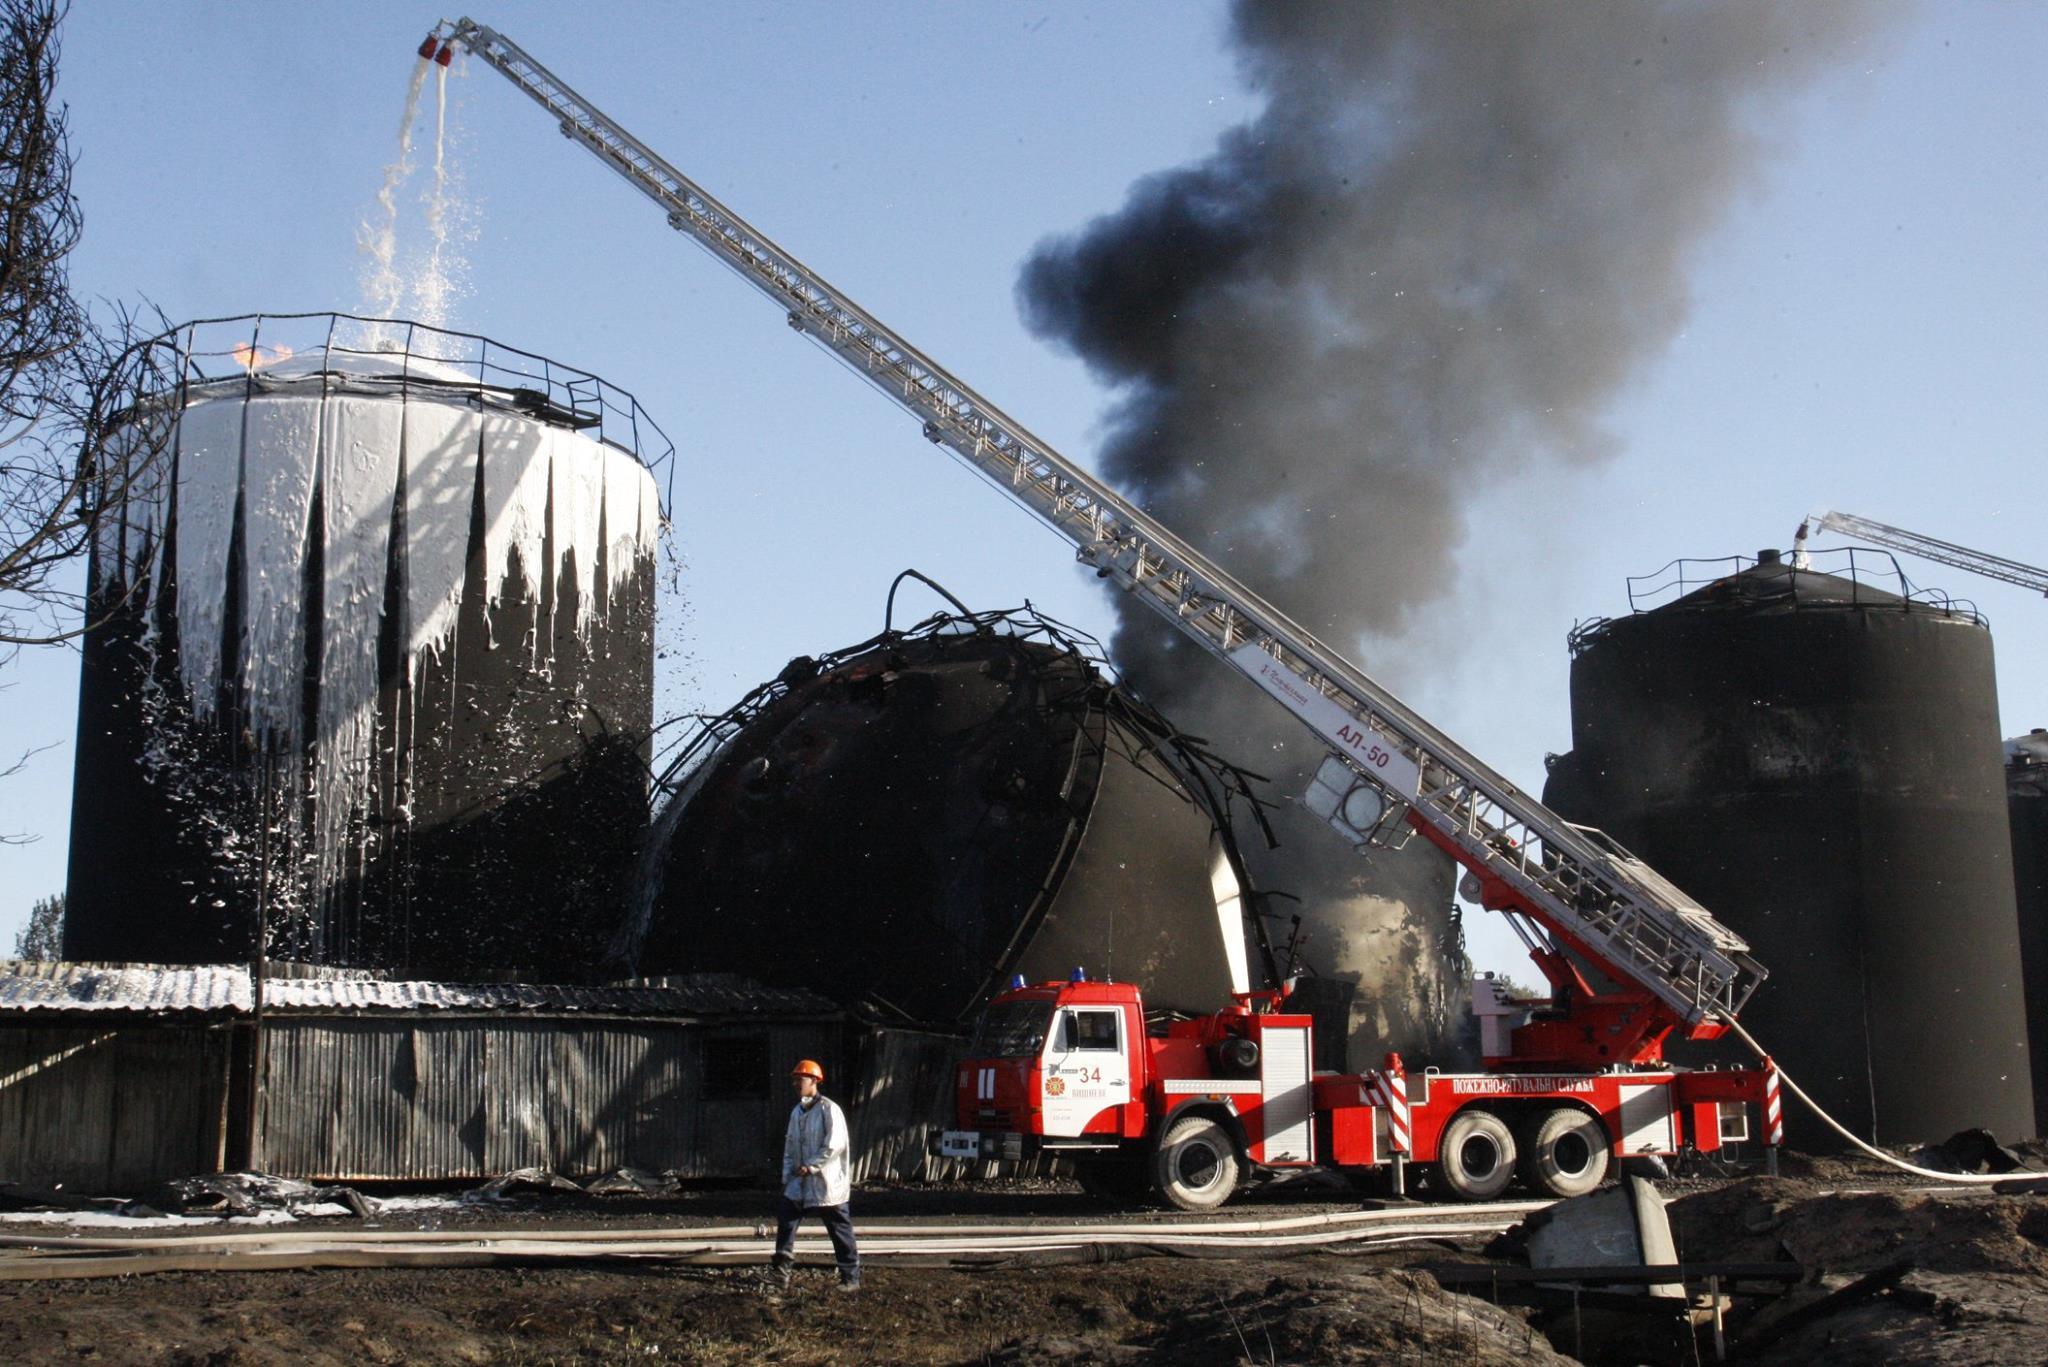 последствия пожара на нефтебазе